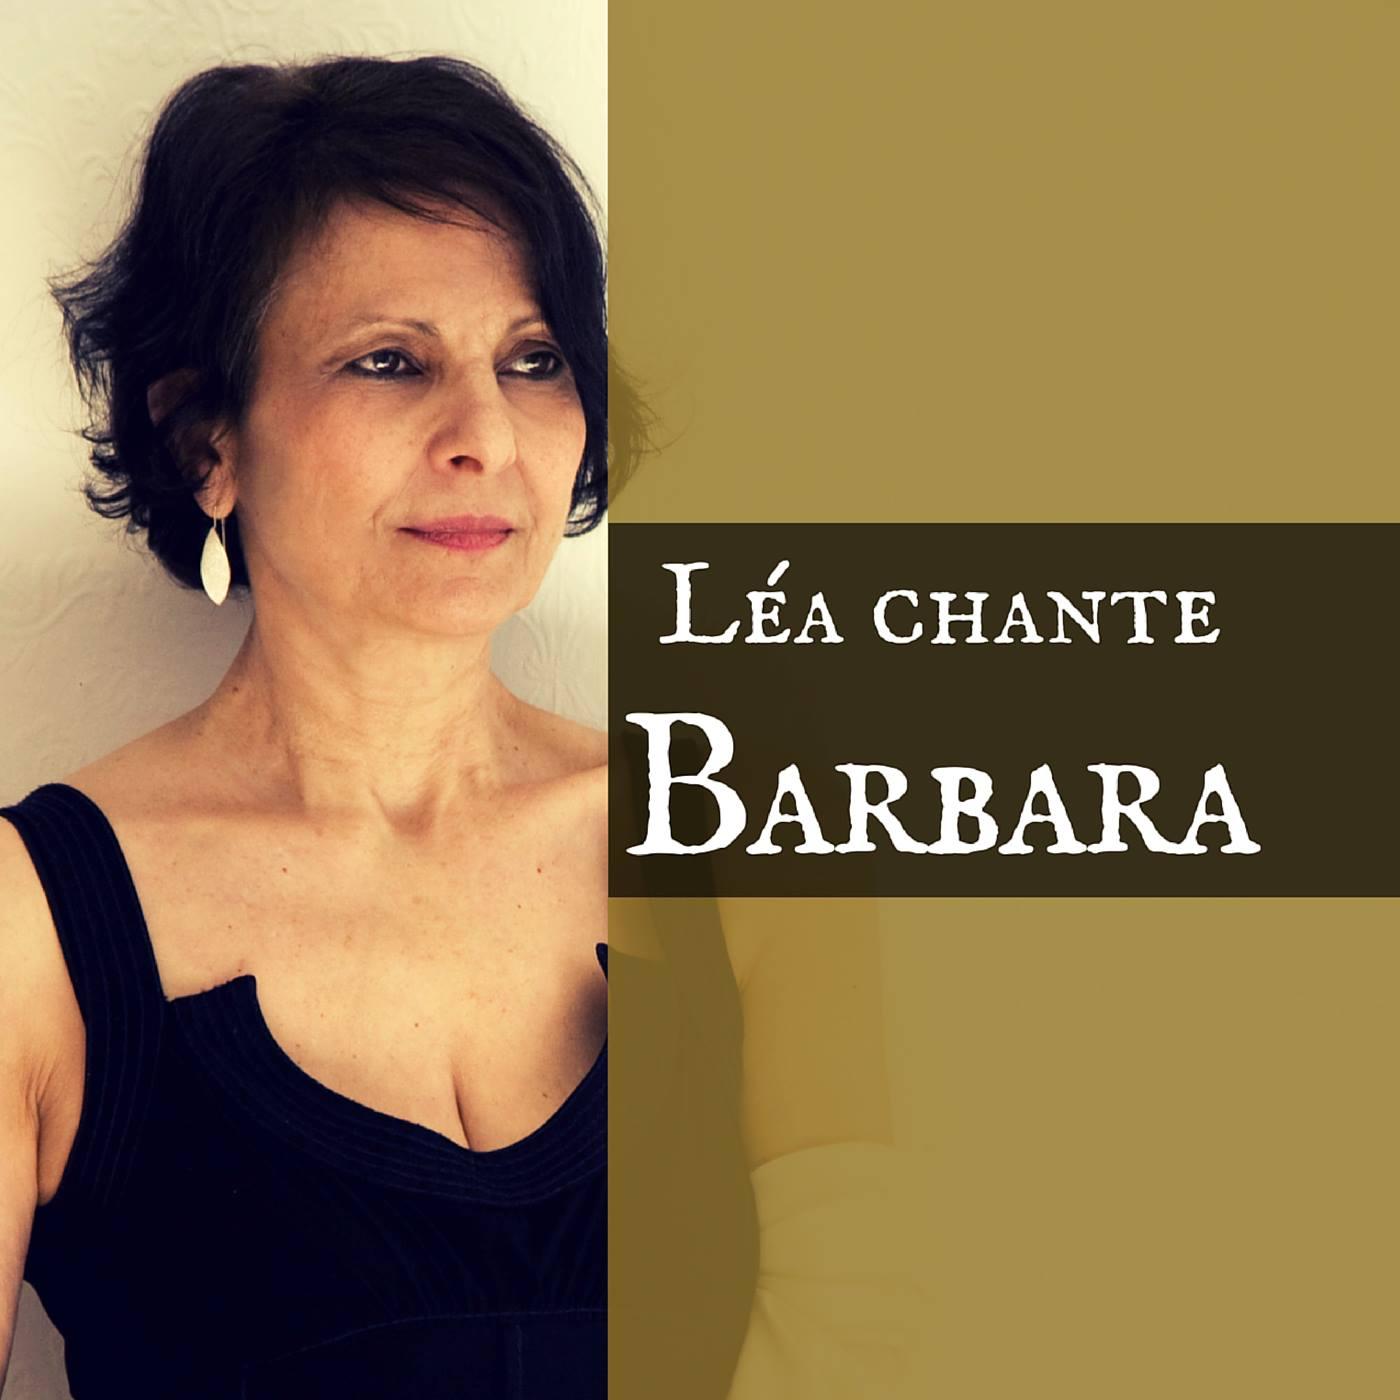 Léa chante Barbara au Café Bialik